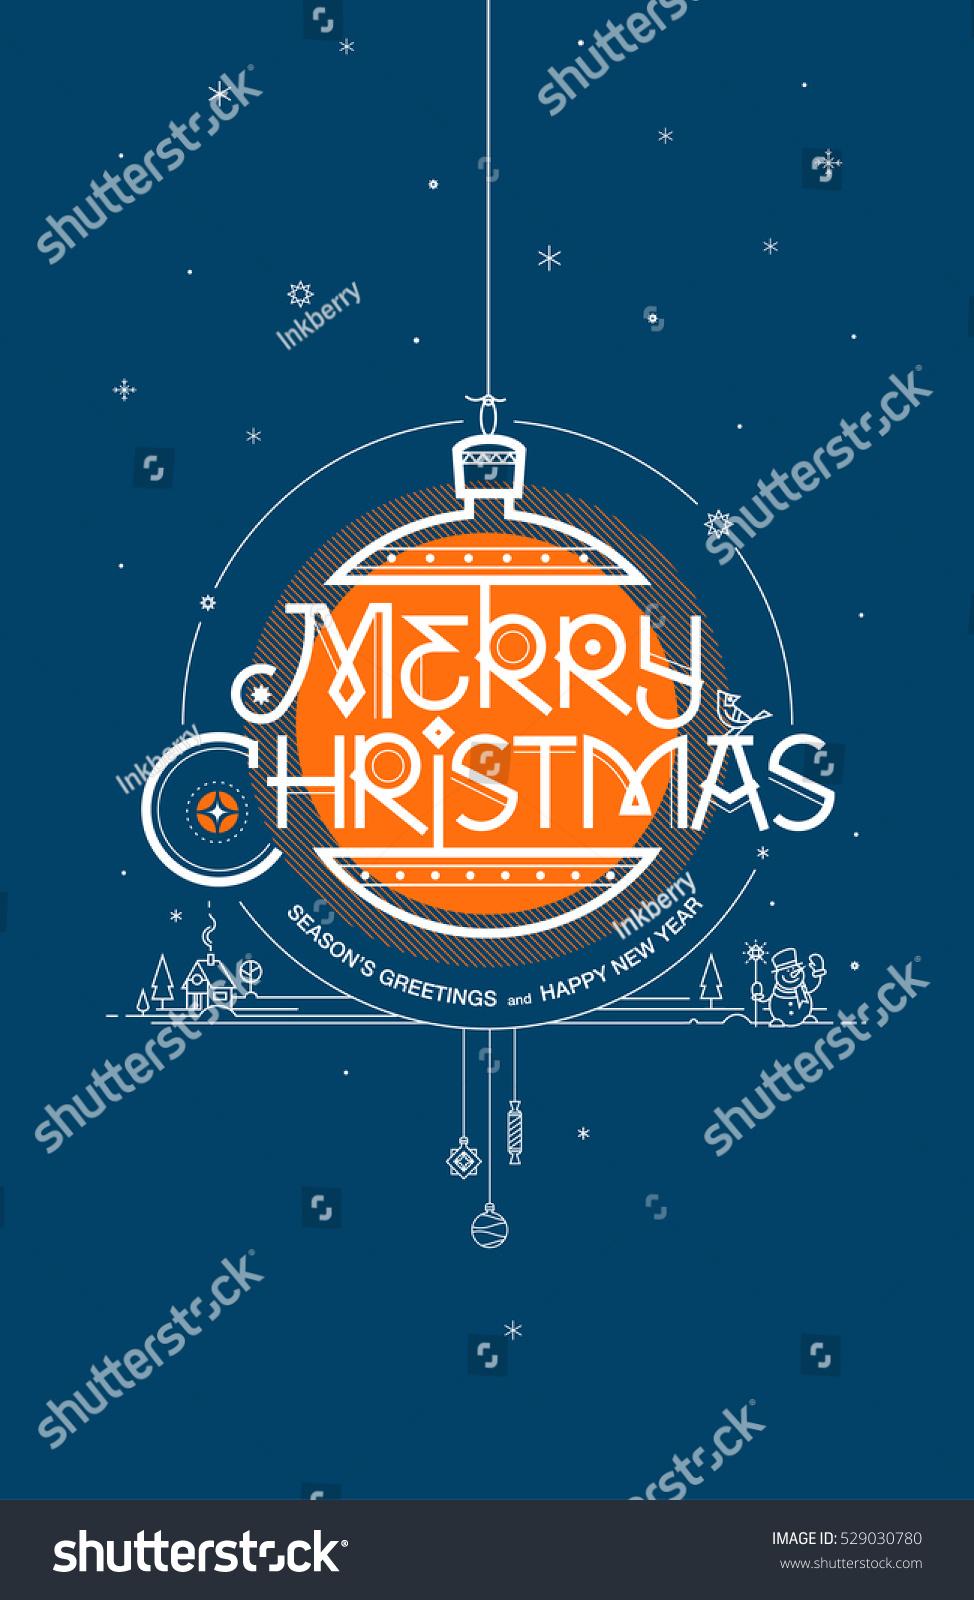 Merry christmas seasons greetings happy new stock vector 529030780 merry christmas seasons greetings and happy new year greeting card vector illustration kristyandbryce Choice Image